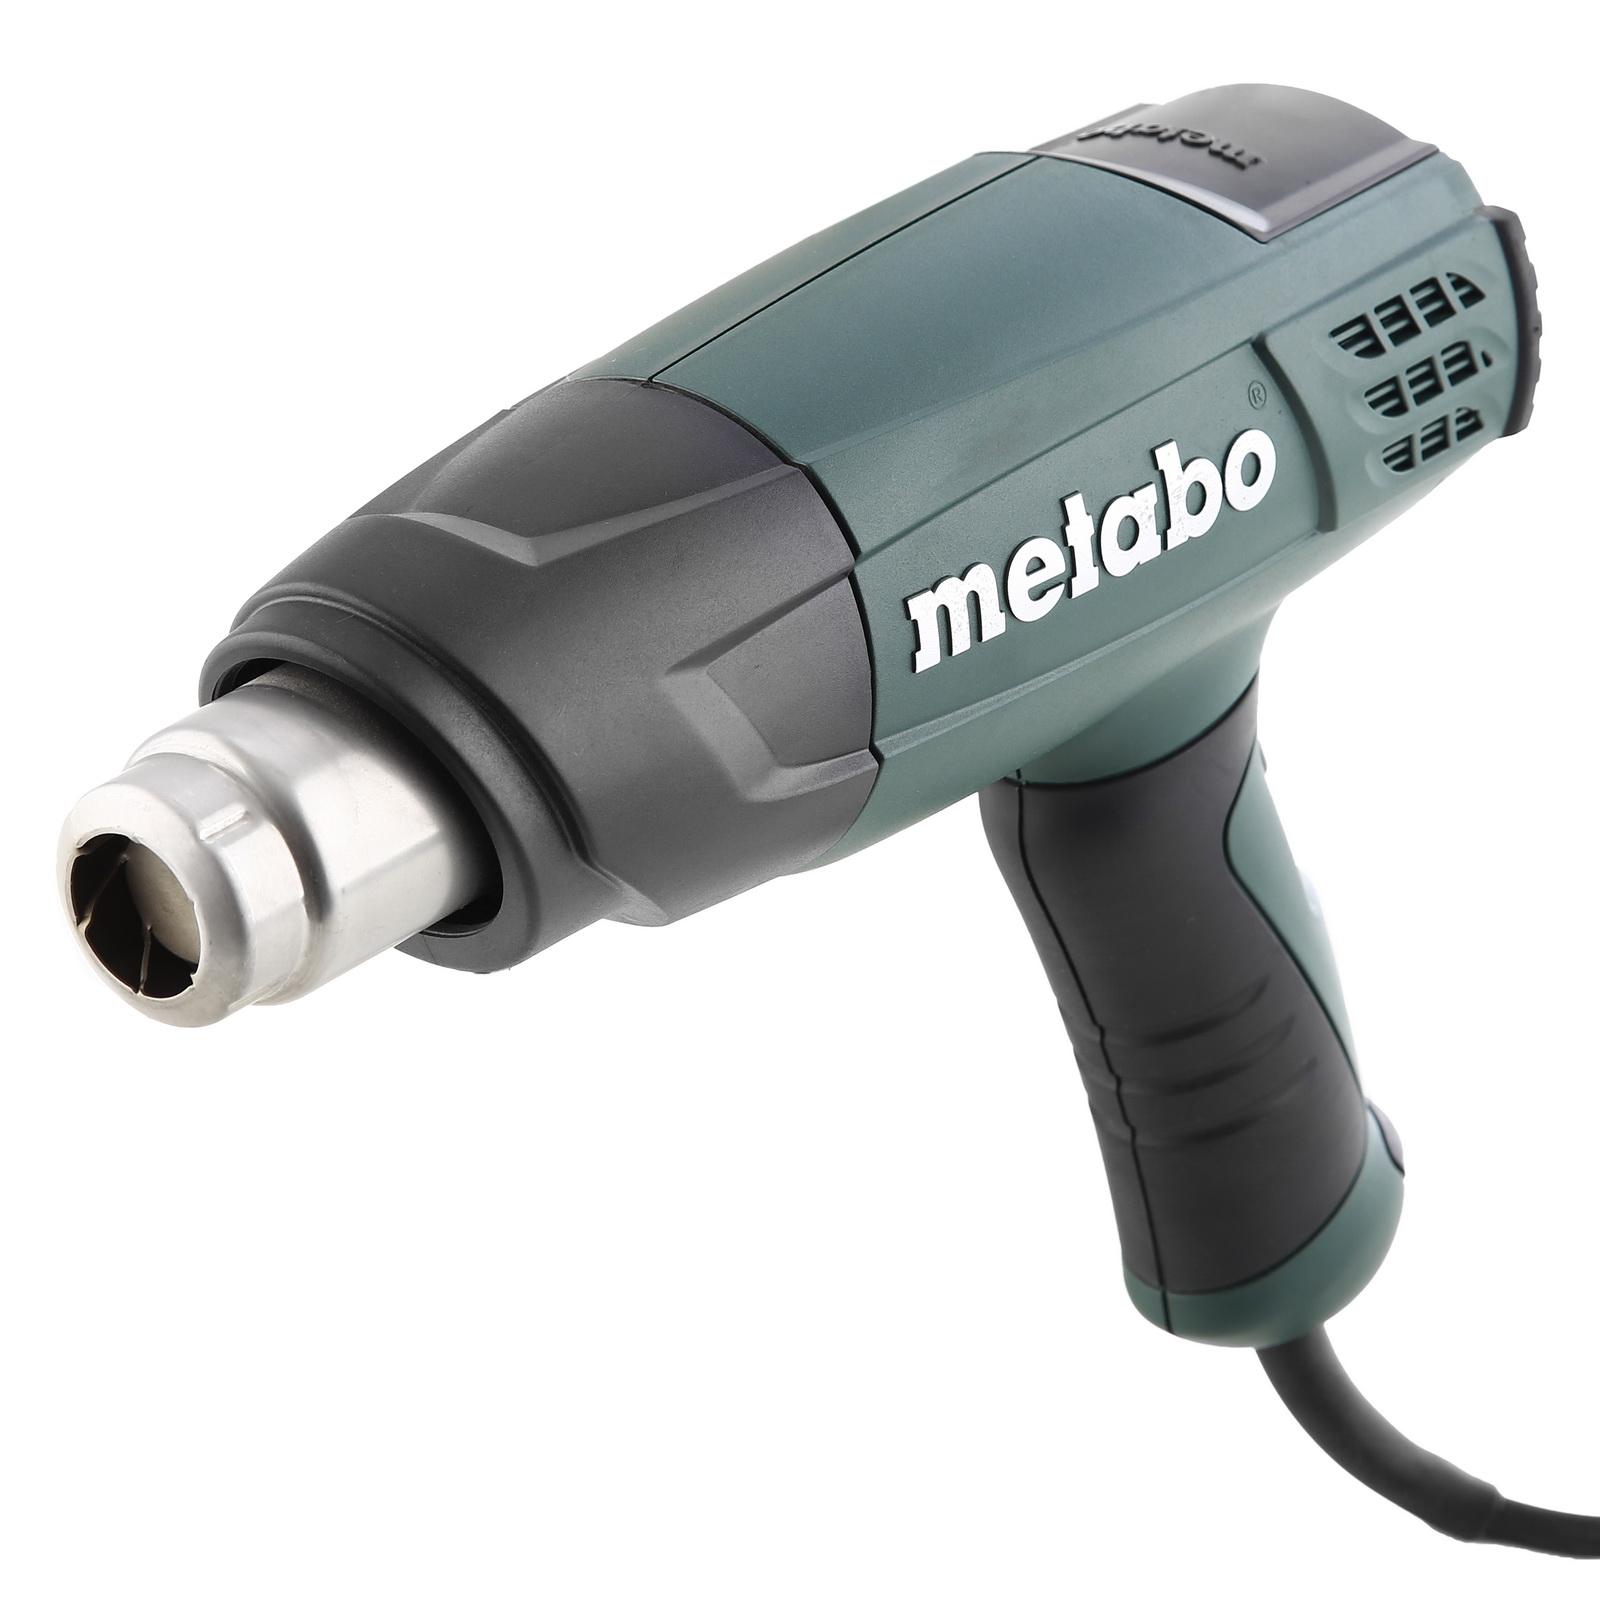 Фен технический Metabo He 20-600 (602060500) строительный фен metabo he 23 650